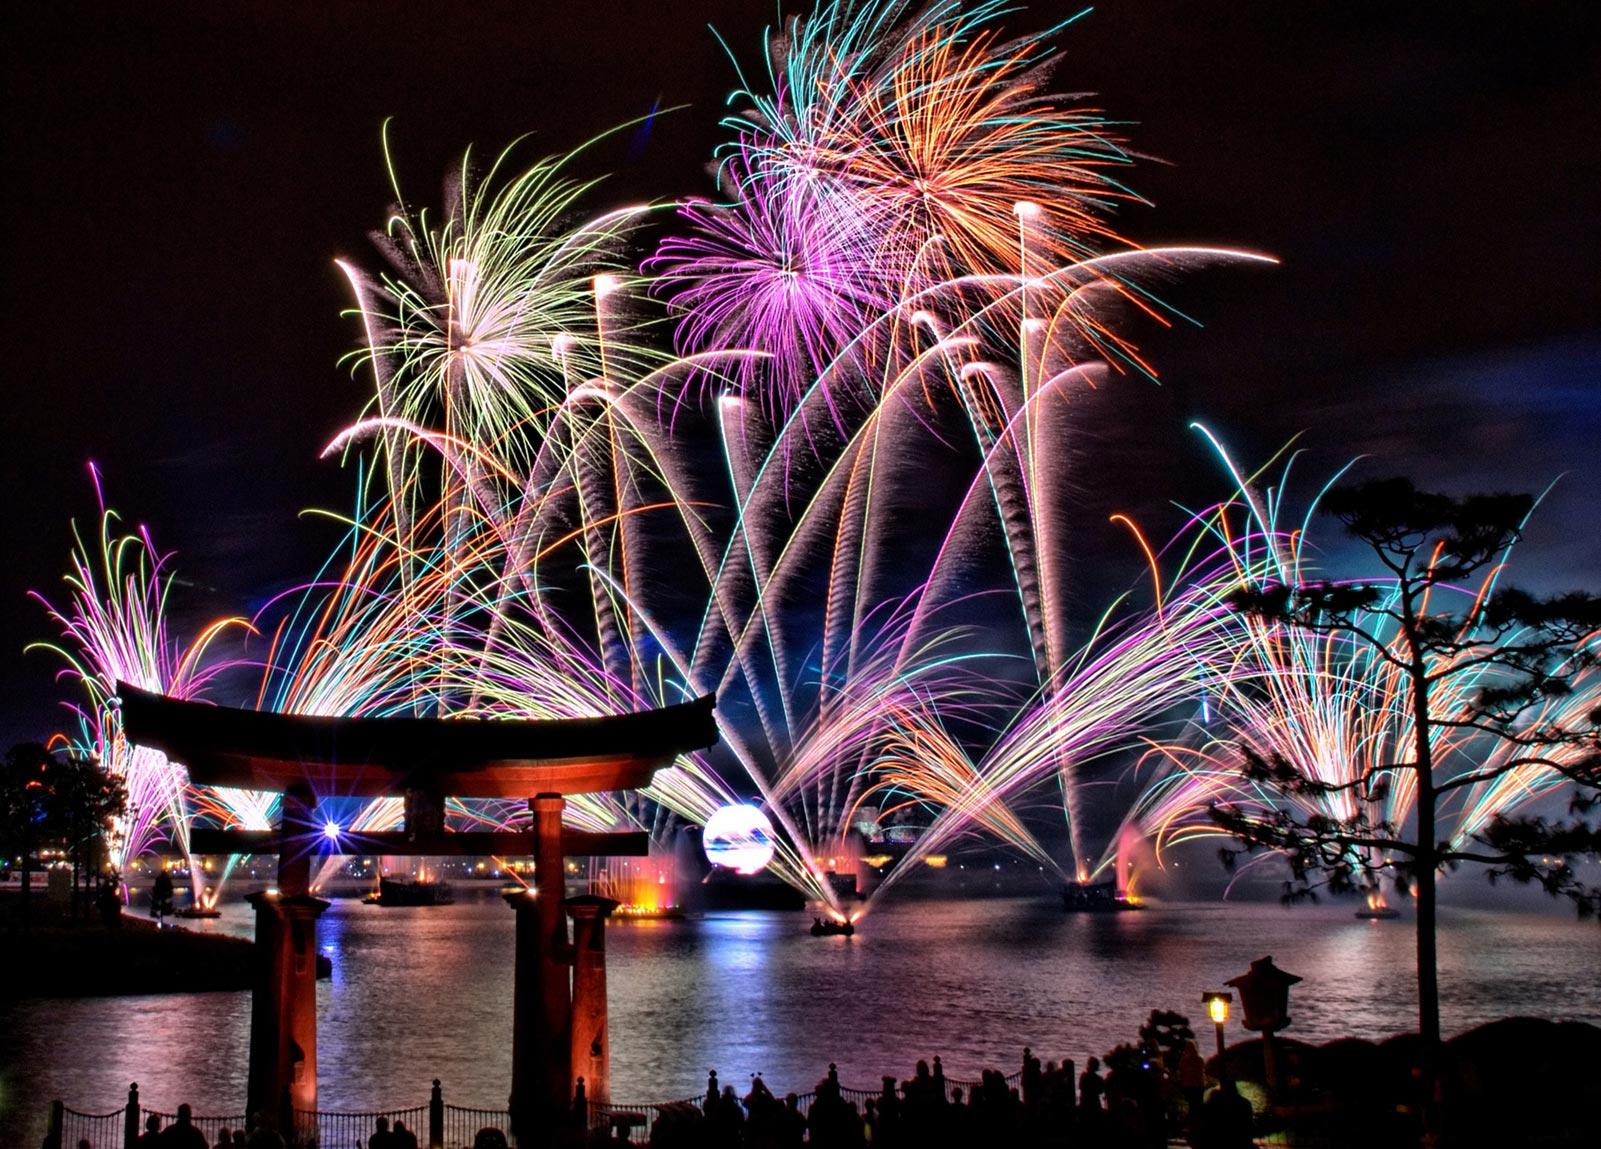 http://www.destination360.com/travel/new-years/tokyo-new-year